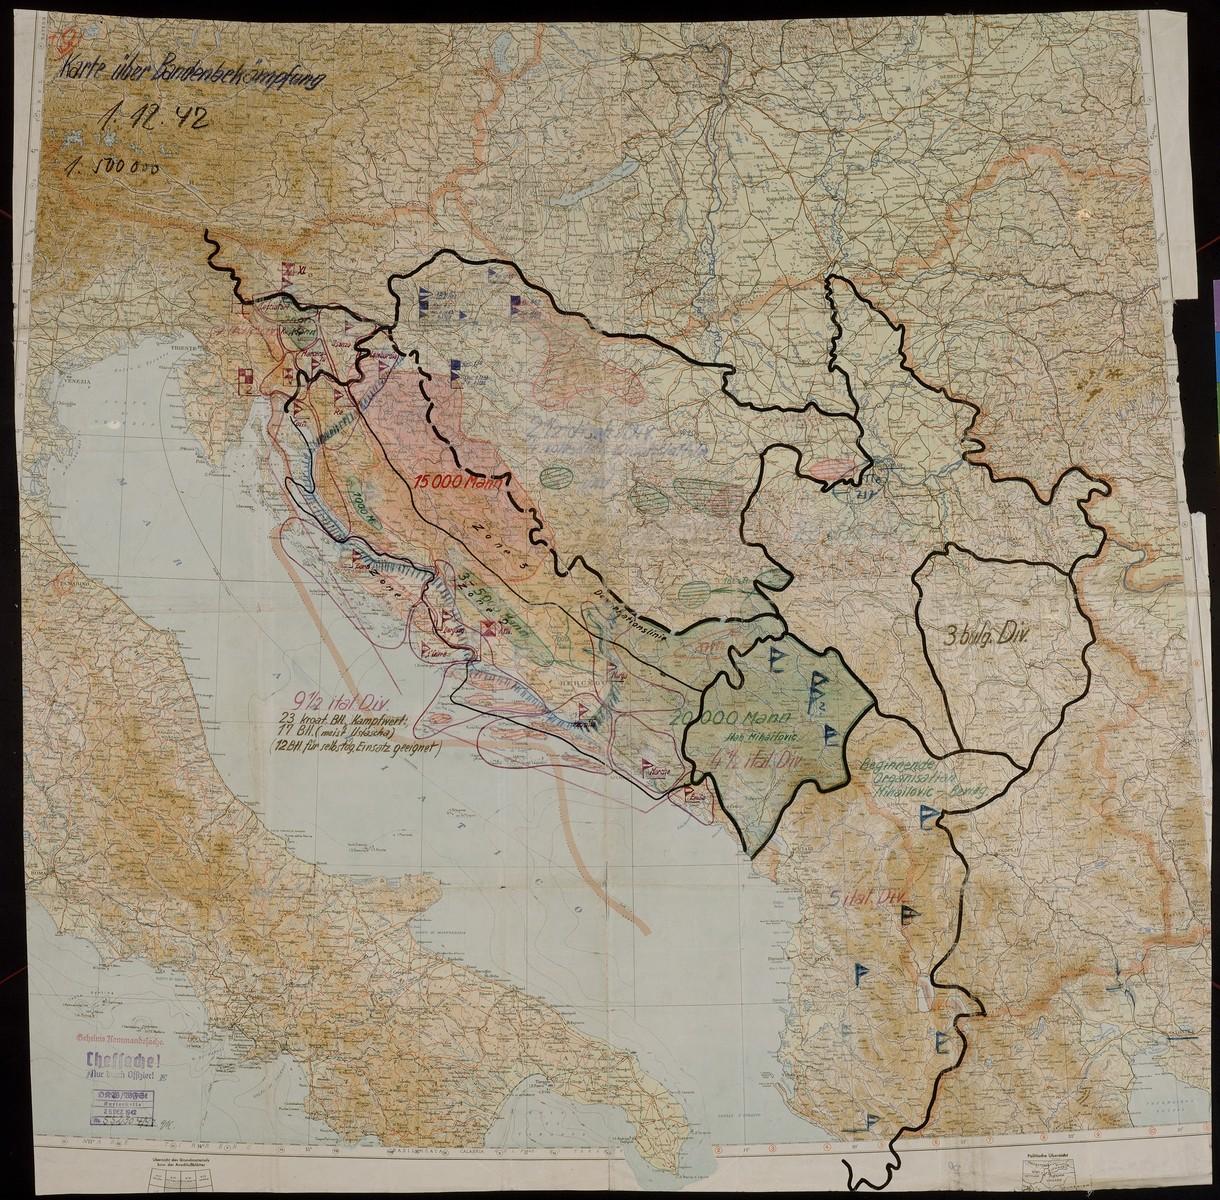 Karte uber Bandenbekampfung.  Concerns partisan activity in Yugoslavia, 1942 Dec. 1.